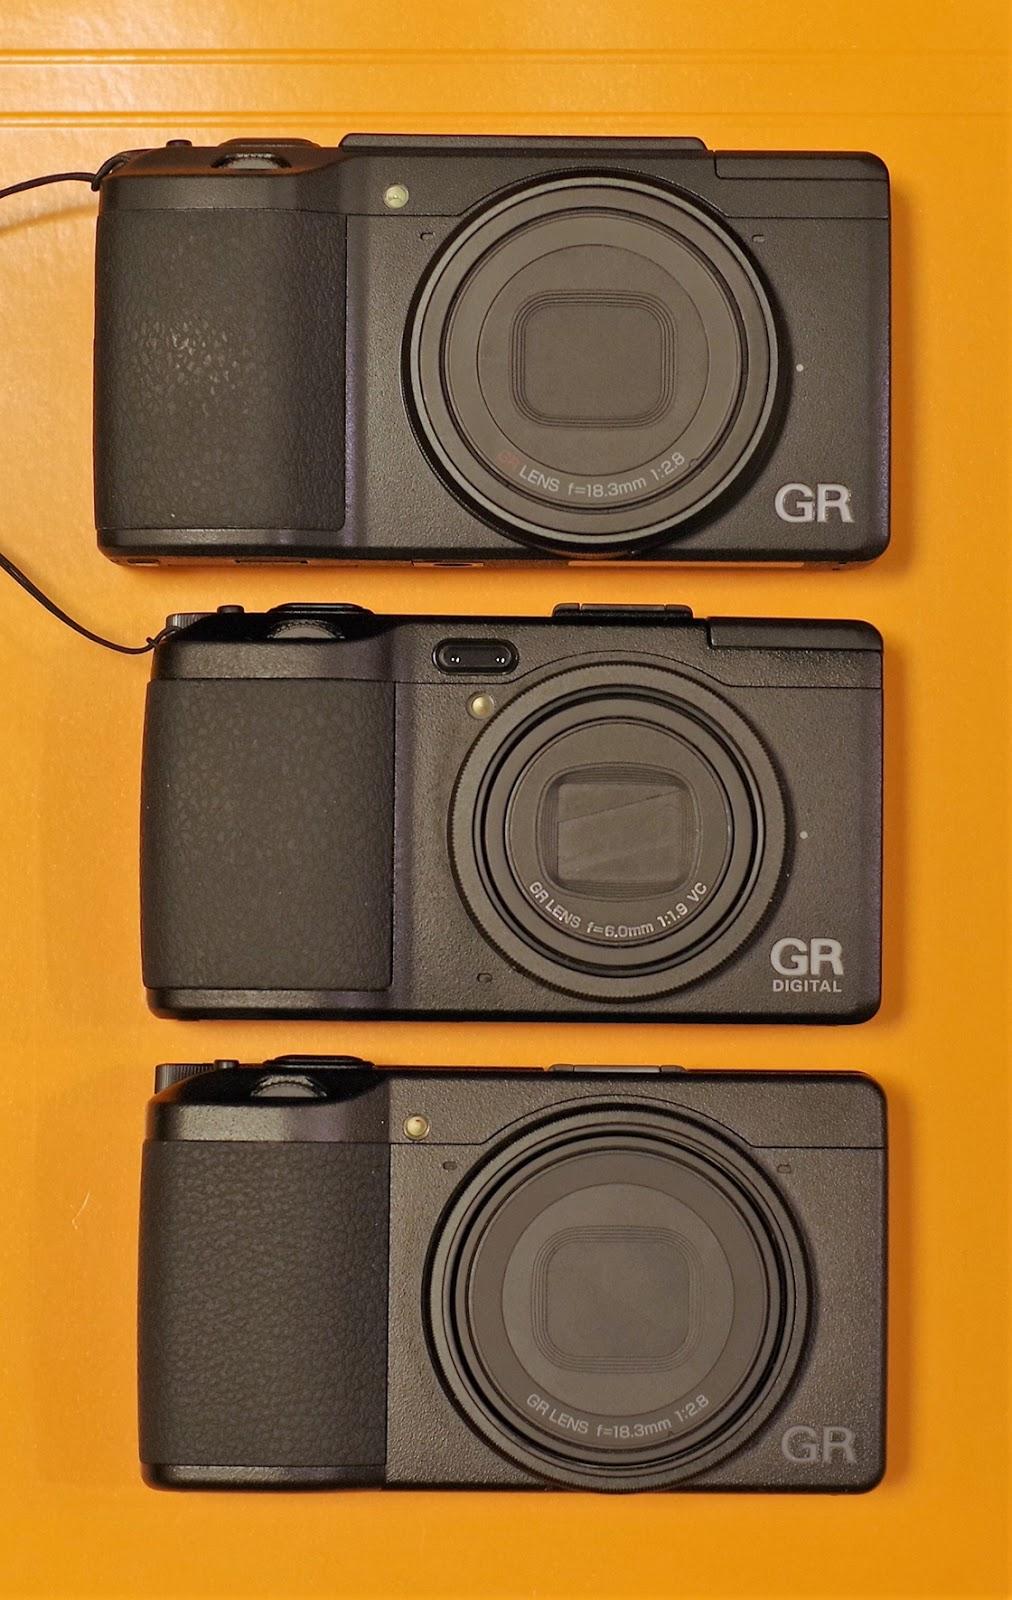 Сравнение габаритов Ricoh GR III, GR Digital IV и GR II